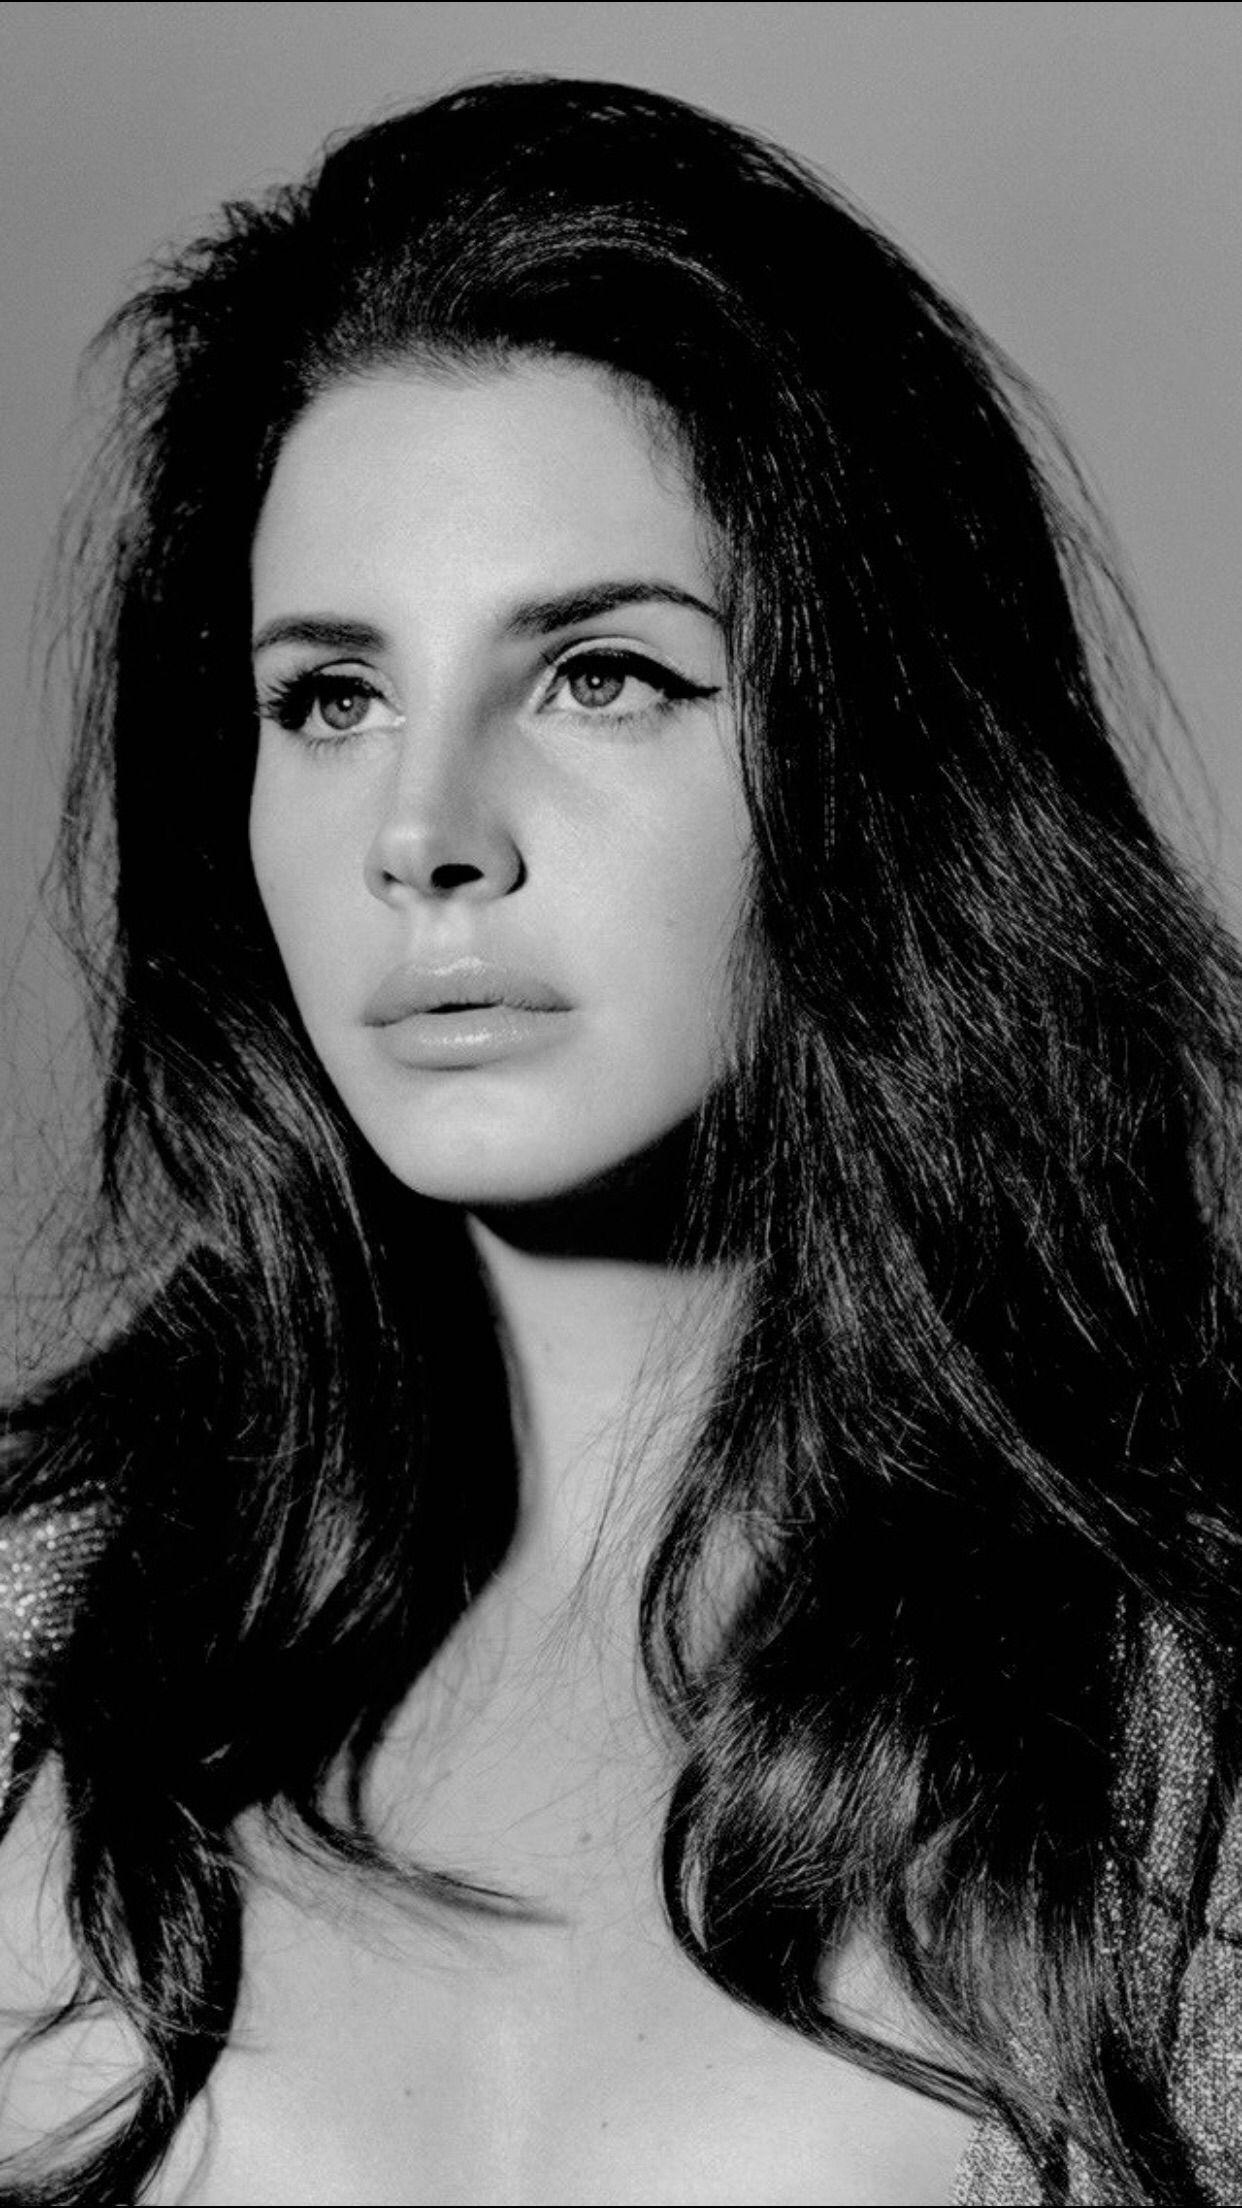 Lana Lanadelreyaesthetic Lana Del Rey Lana Del Rey Art Portrait